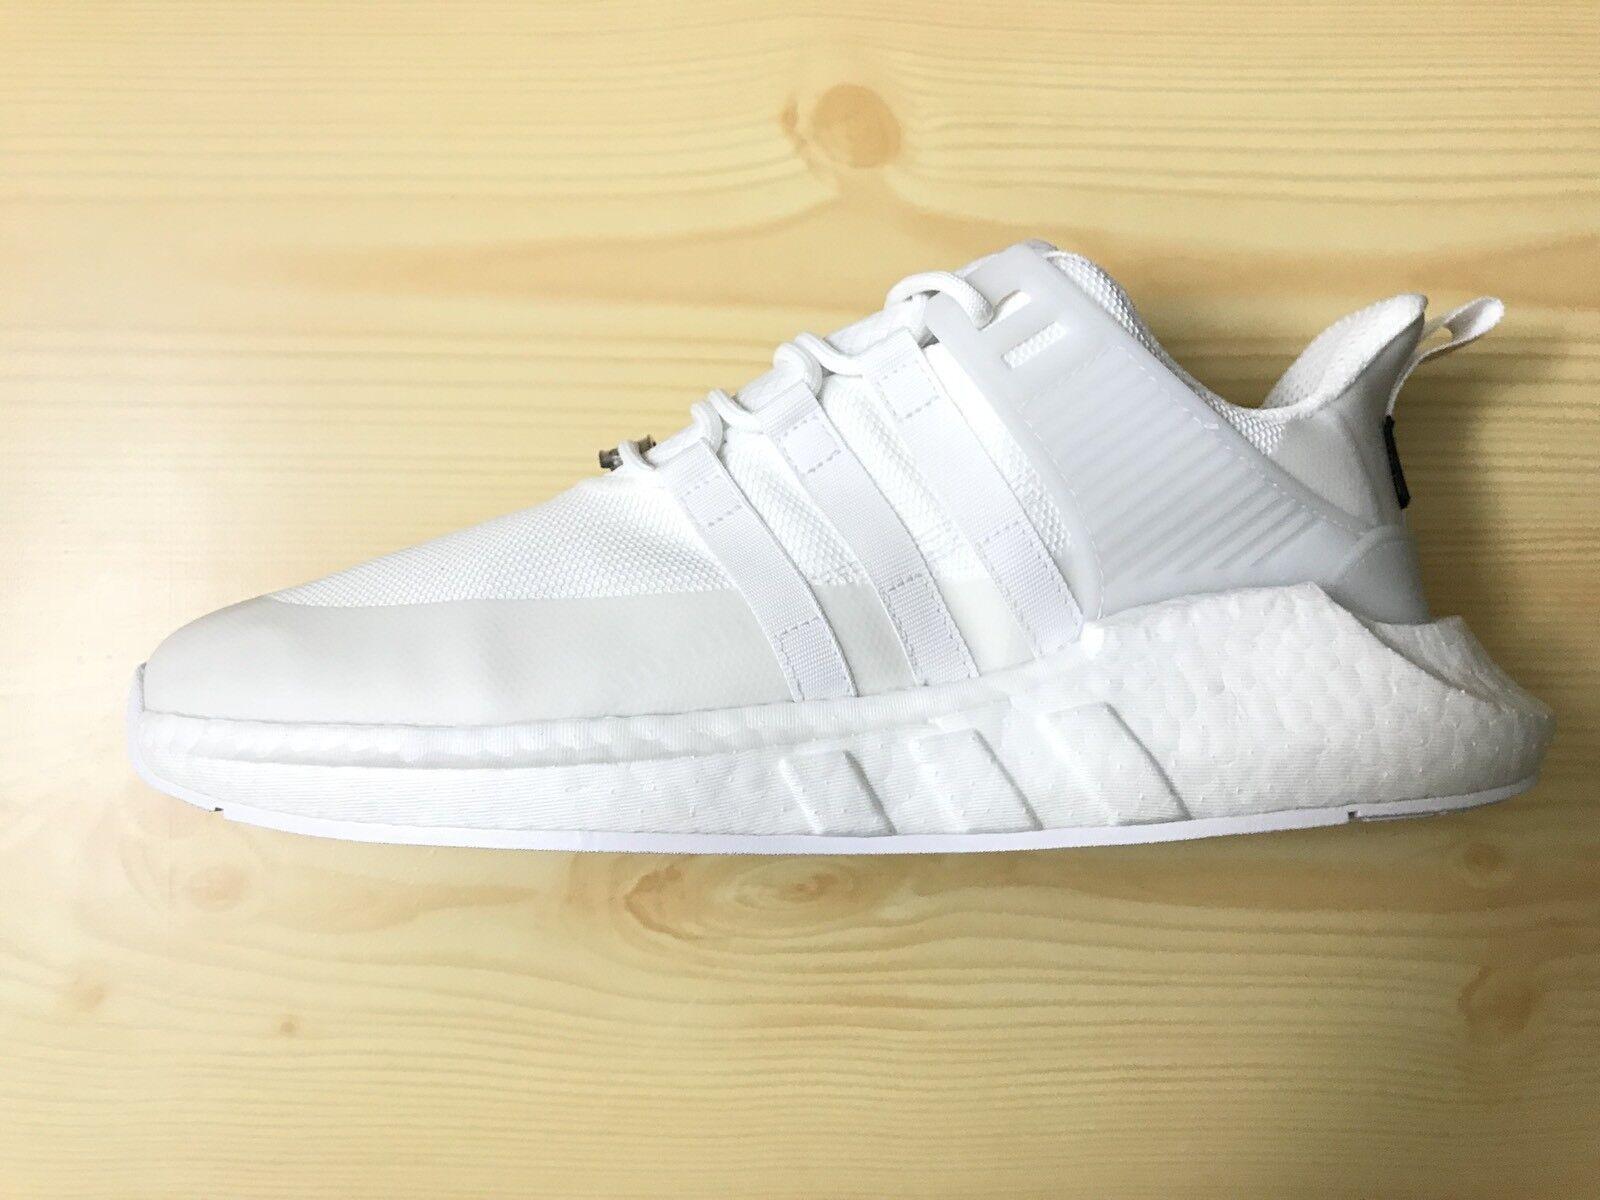 Adidas Adidas Adidas eqt sostegno 93 / 17 impulso fc814e